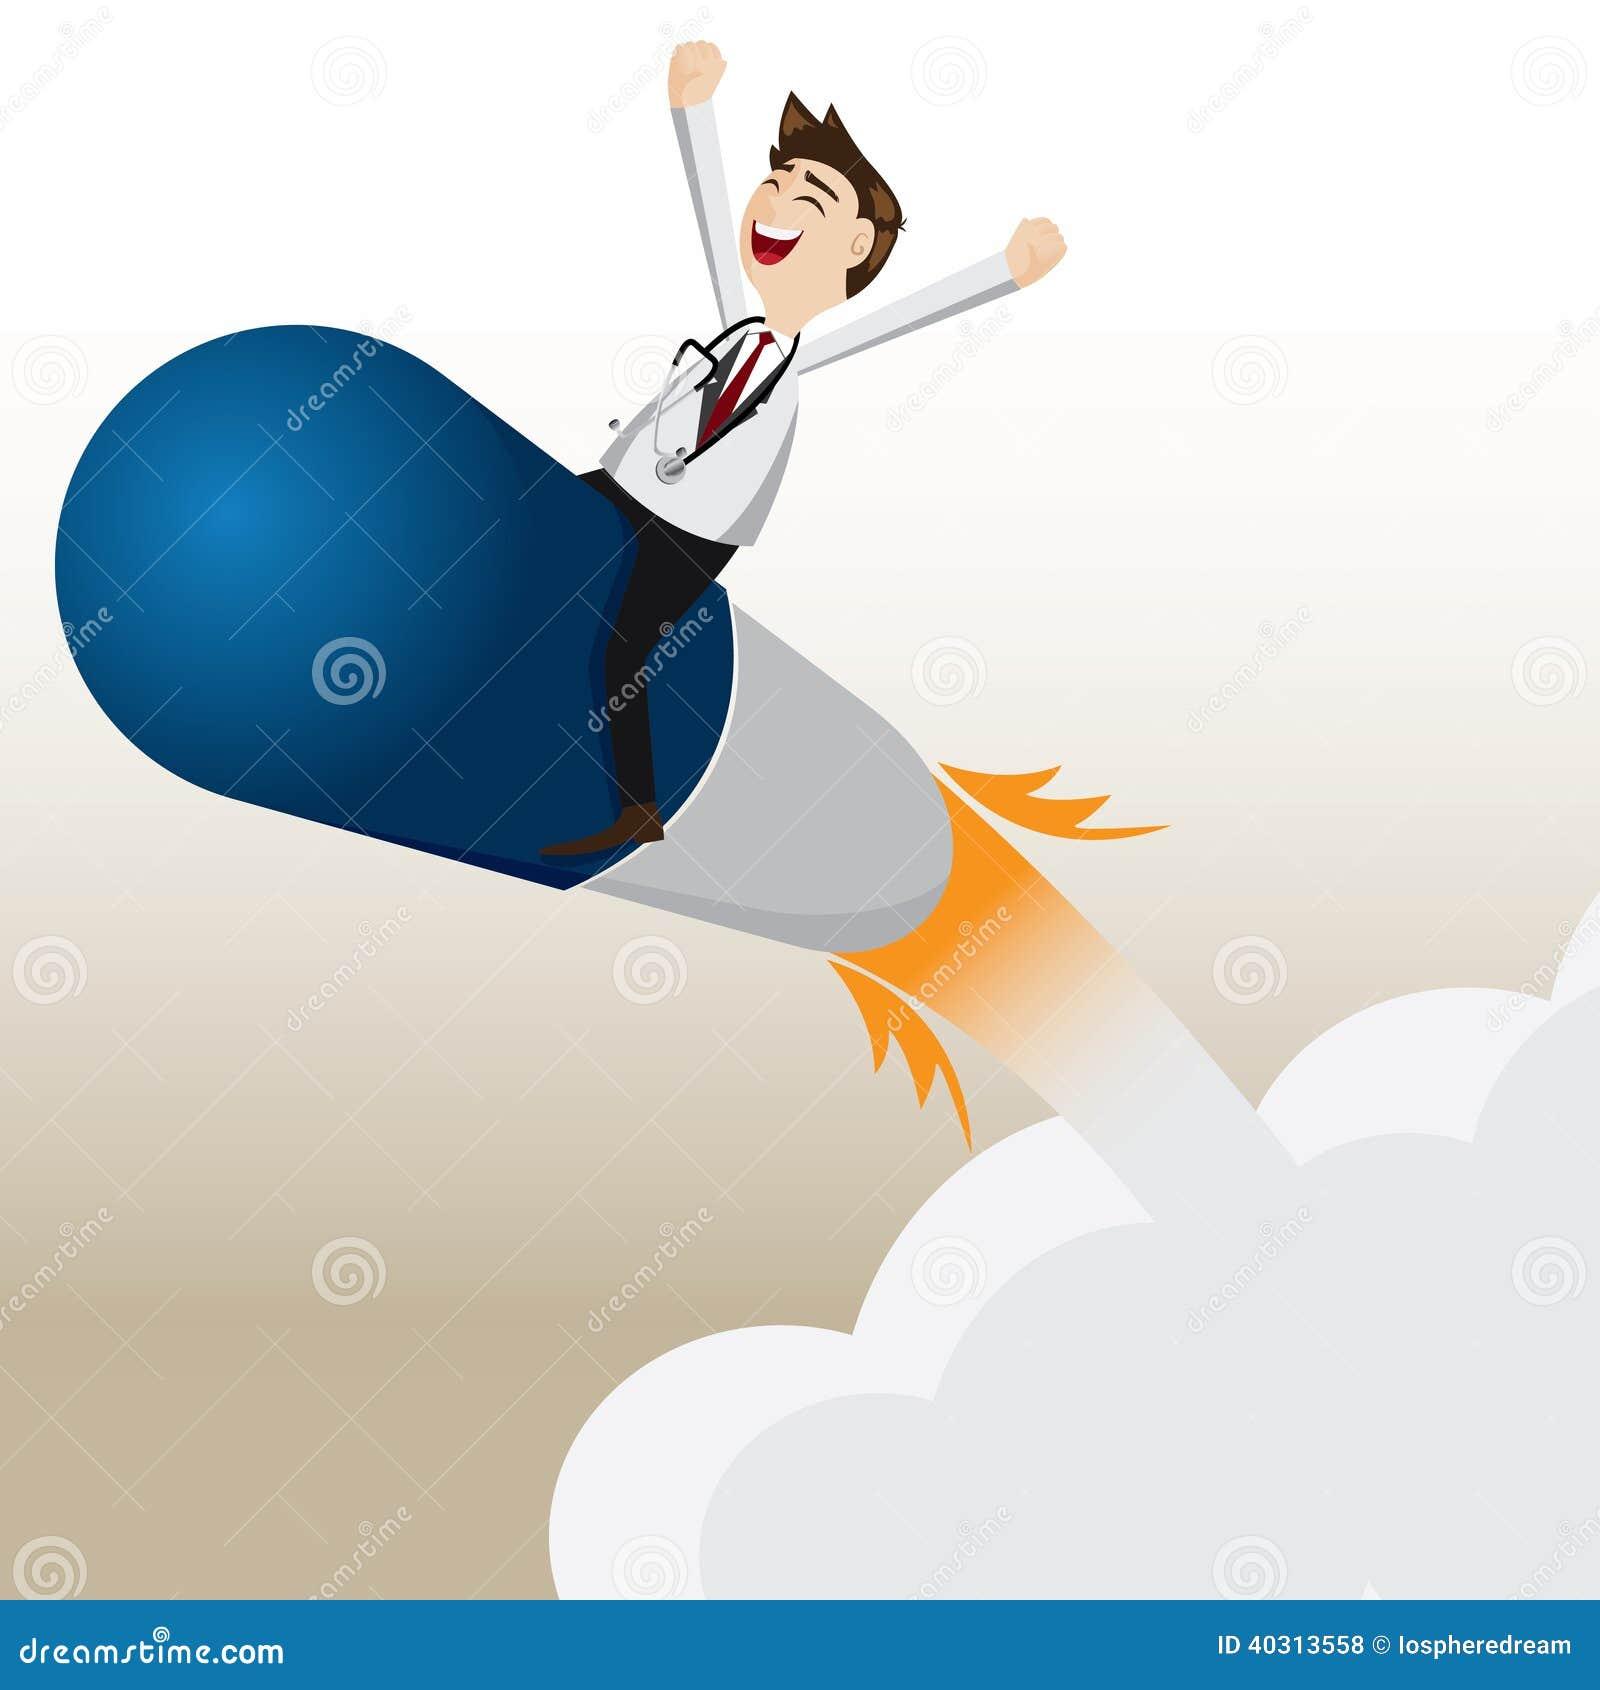 ... Pharmacist Riding Capsule Missile Stock Vector - Image: 40313558 Superhero Flying Vector